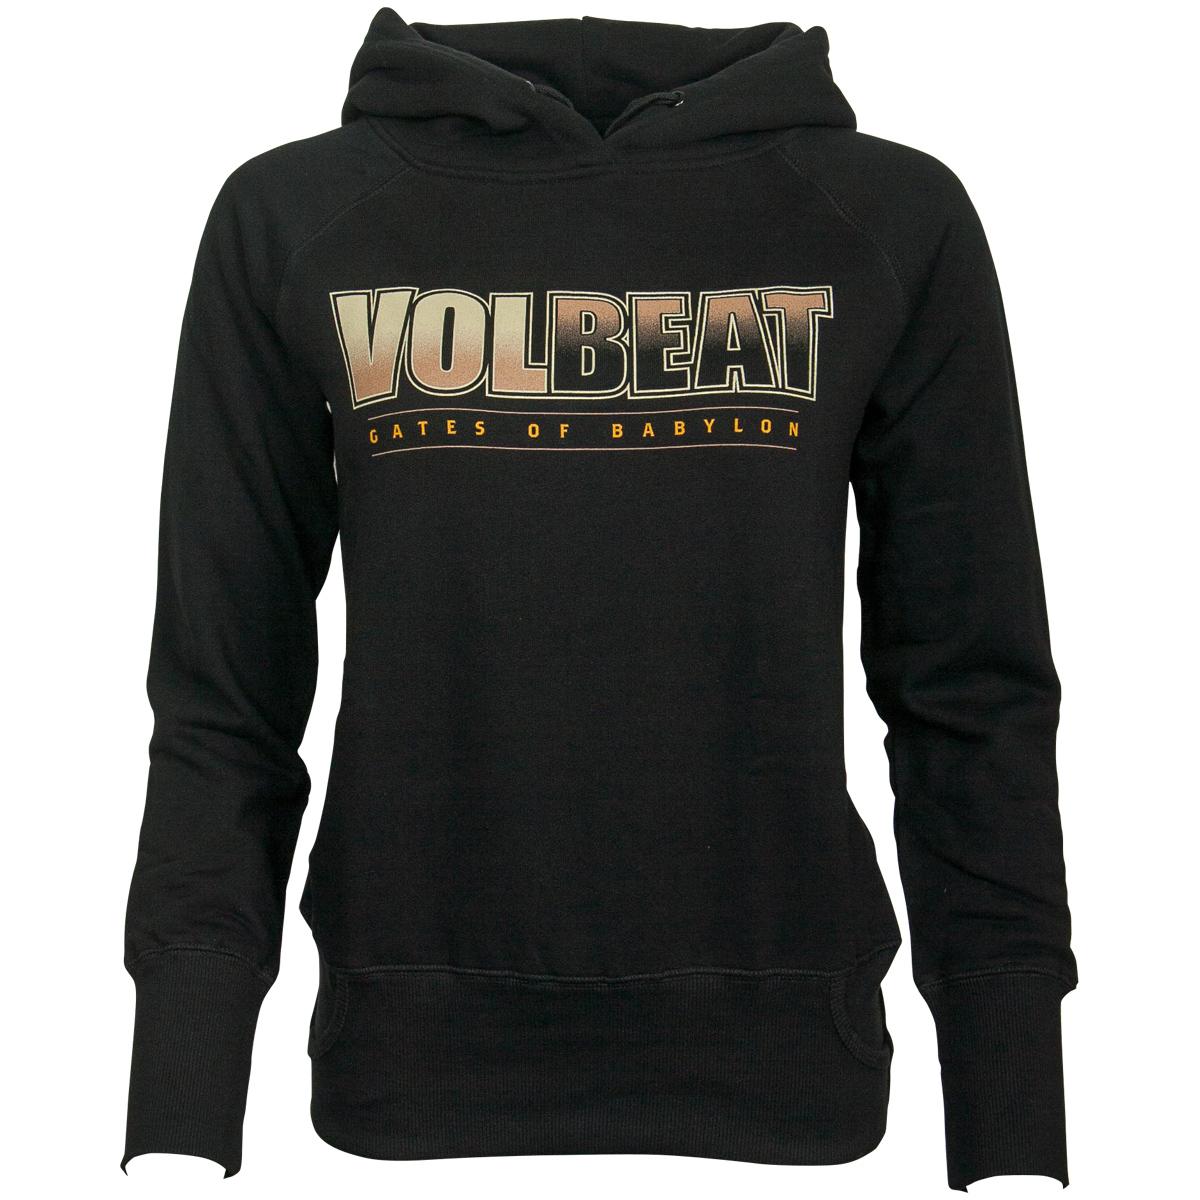 Volbeat - Damen Kapuzenpullover Babylon Goddess - schwarz